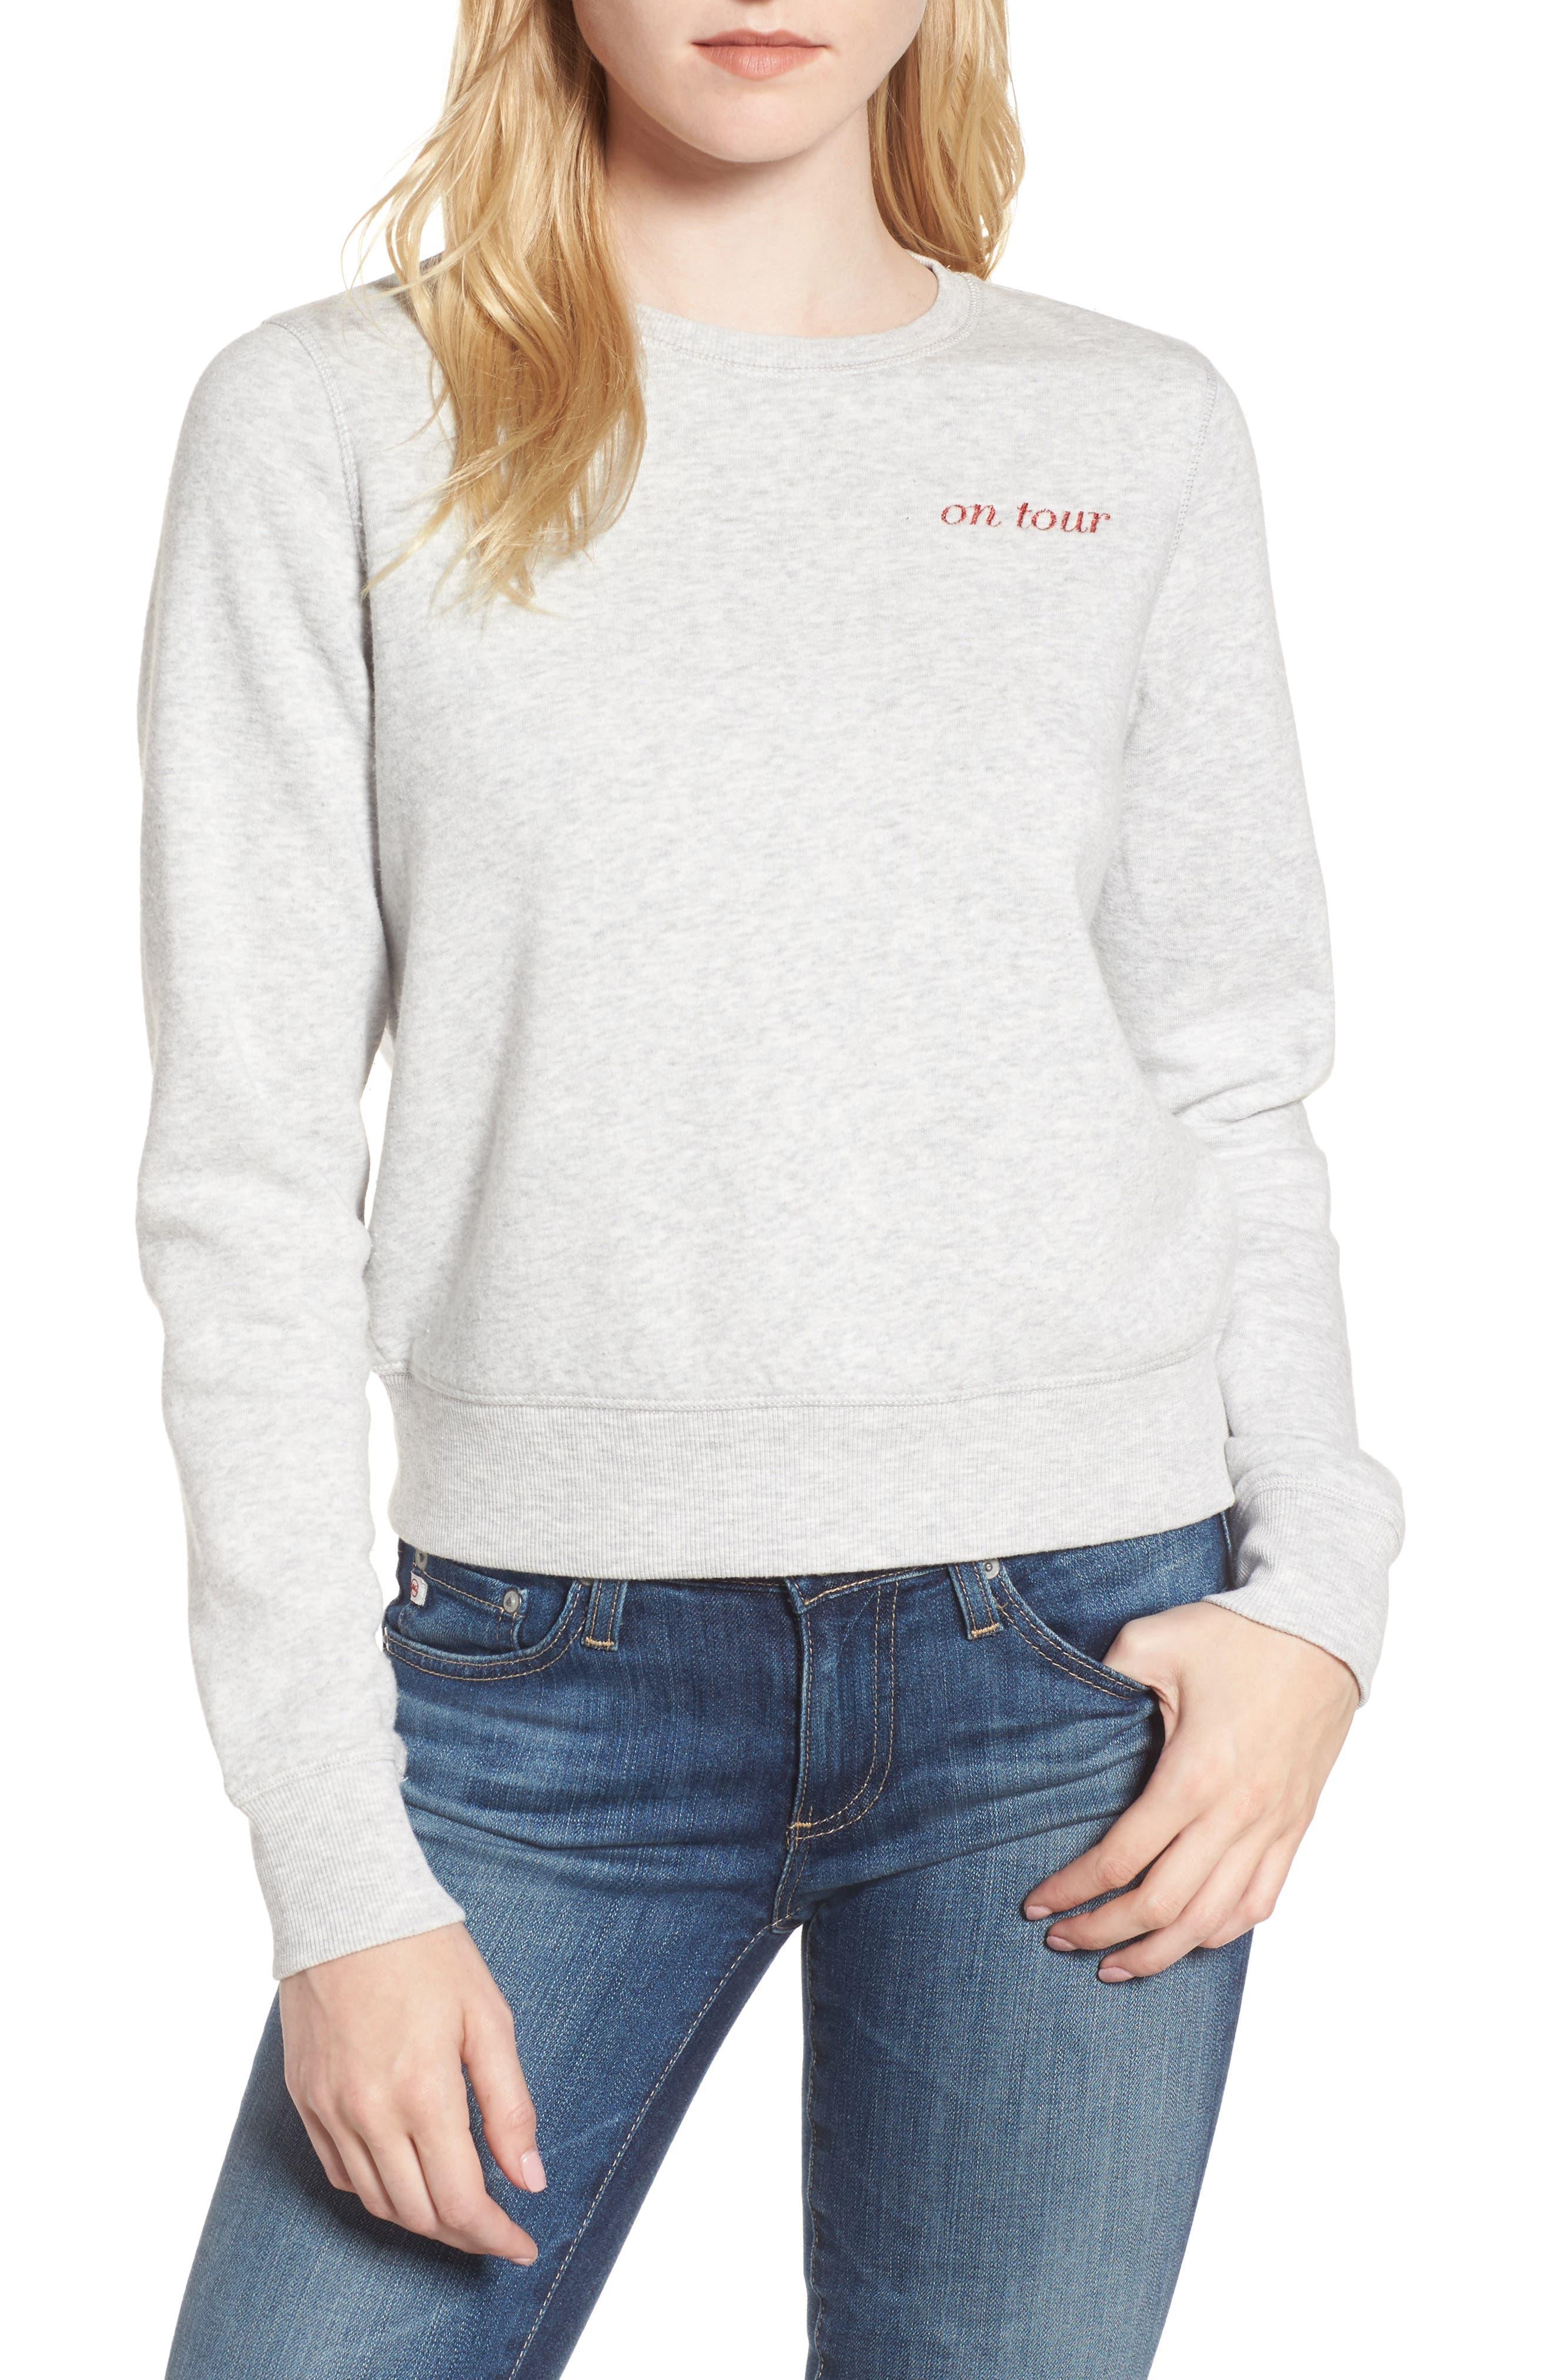 Main Image - Rebecca Minkoff Kassidy Tour Sweatshirt